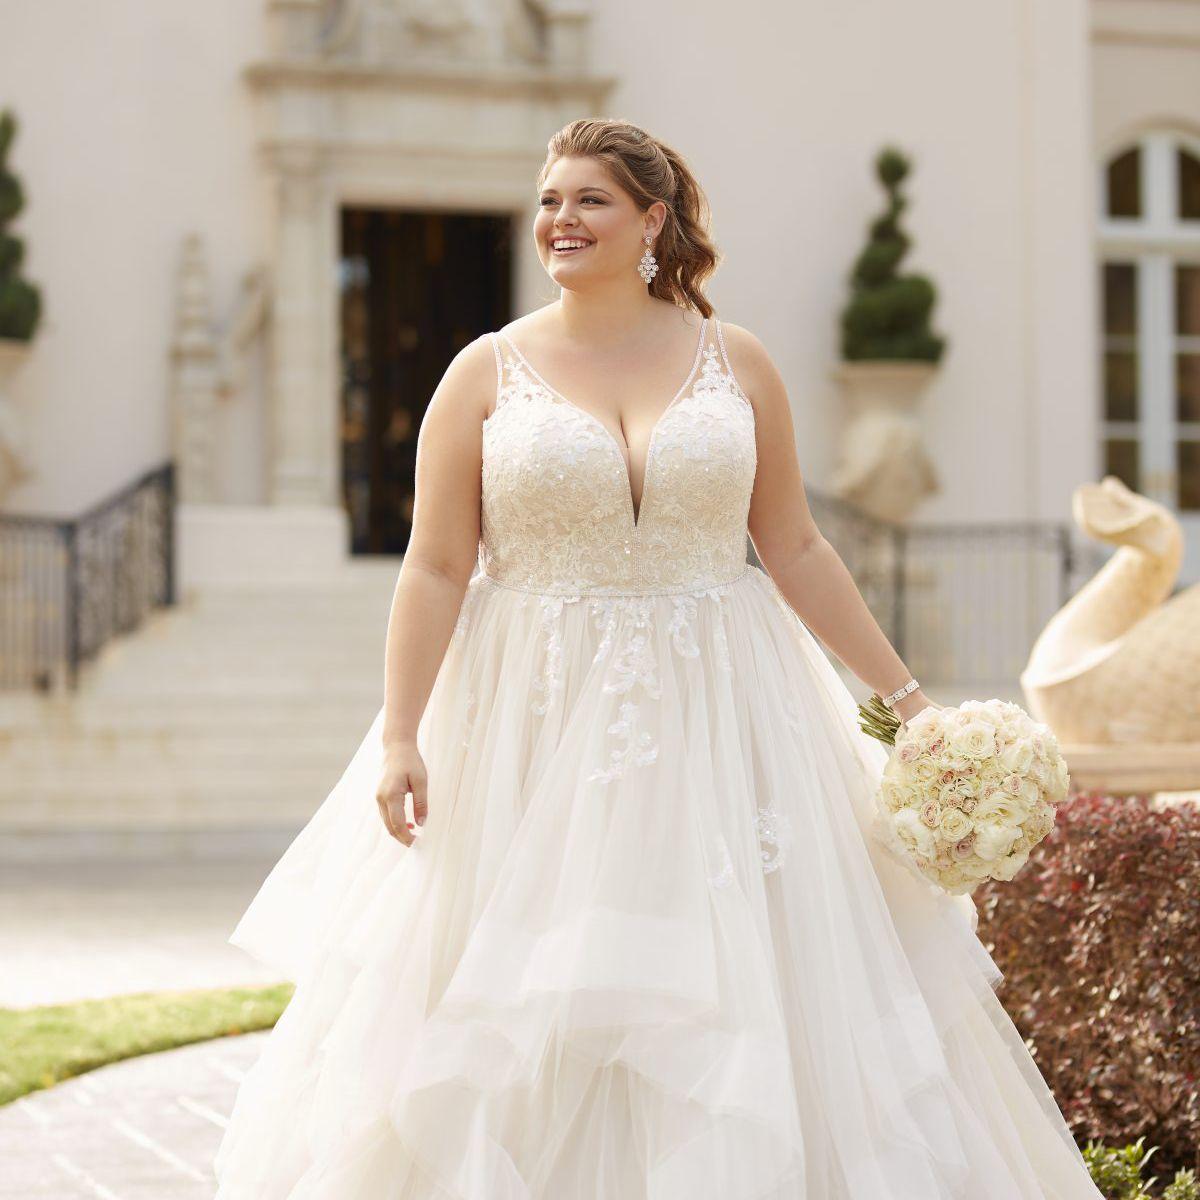 11 Best Wedding Dress Styles For Plus Sizes,Figure Flattering Wedding Dresses